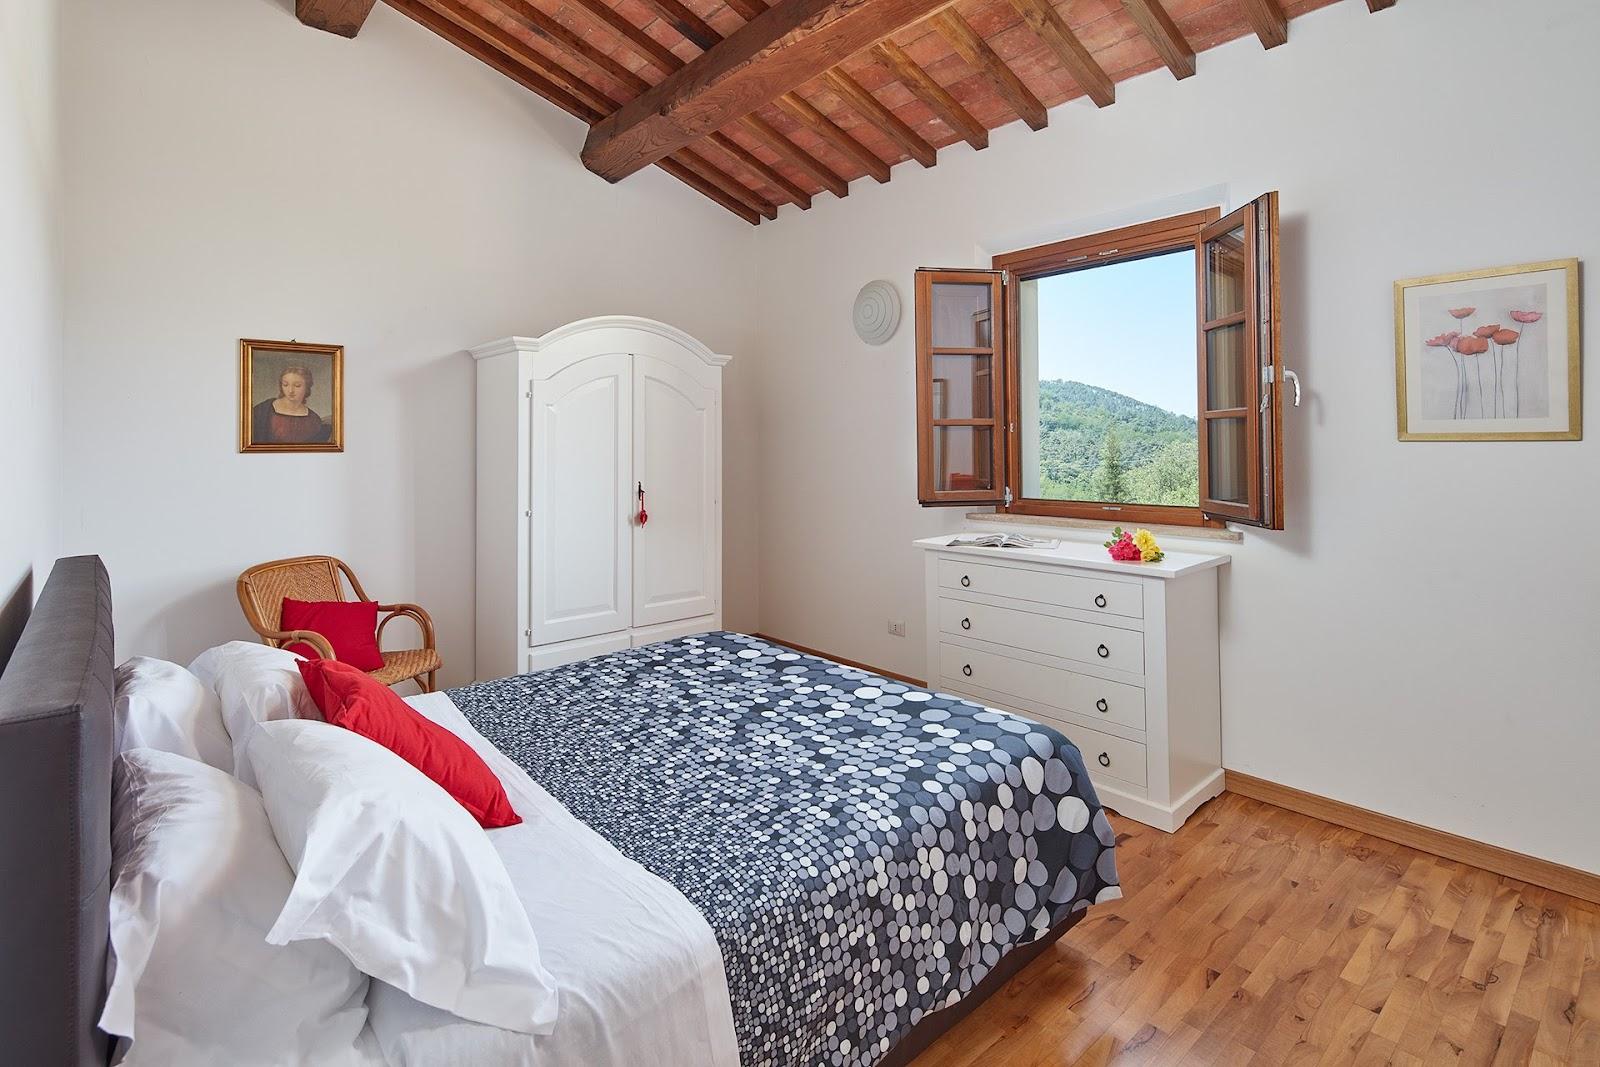 Ferienhaus Corte Paradiso (2570342), Monsummano Terme, Pistoia, Toskana, Italien, Bild 27